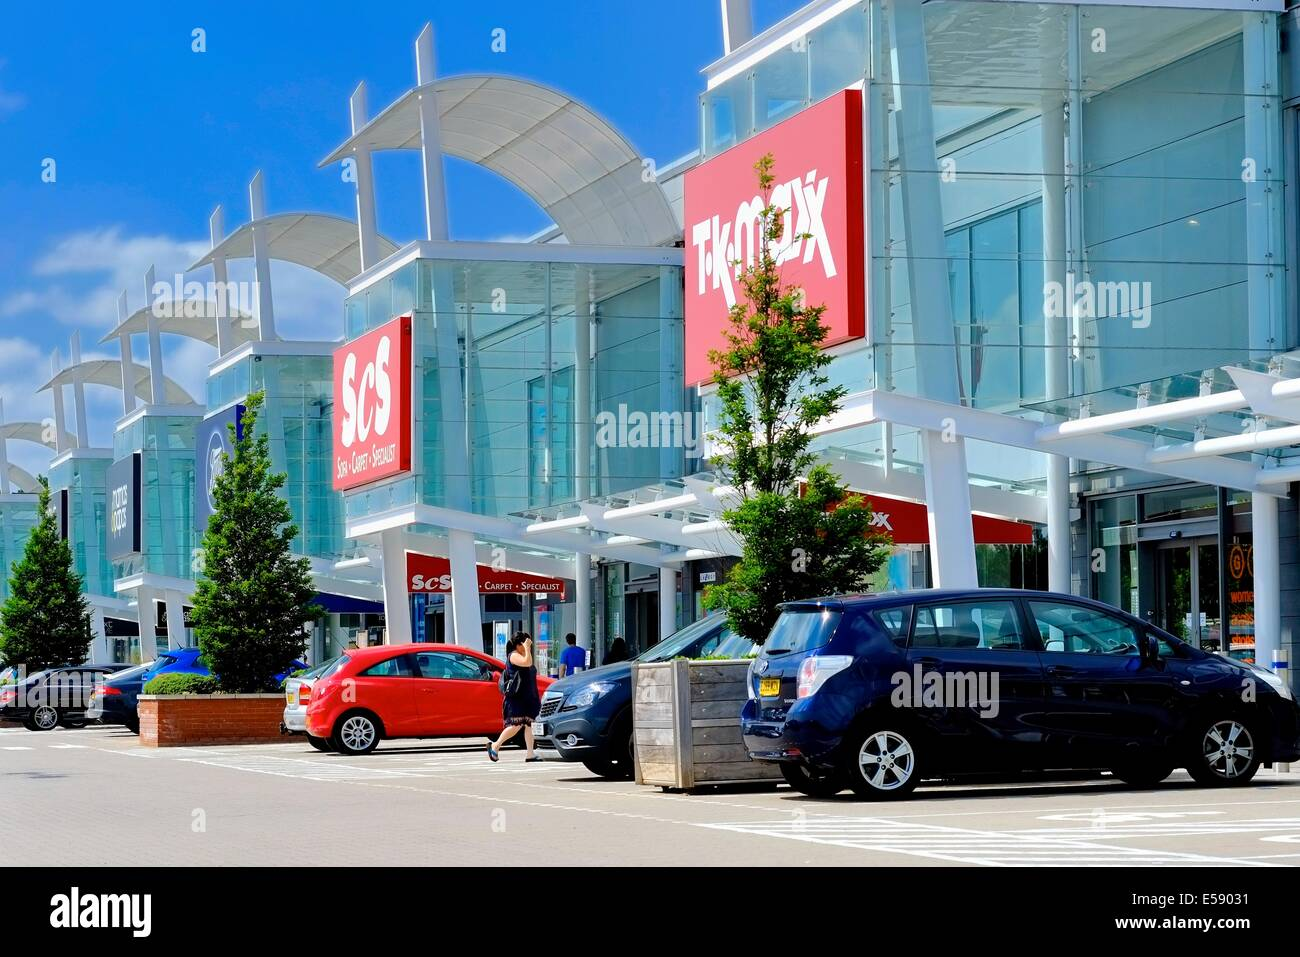 The Giltbrook retail park Nottingham england uk - Stock Image